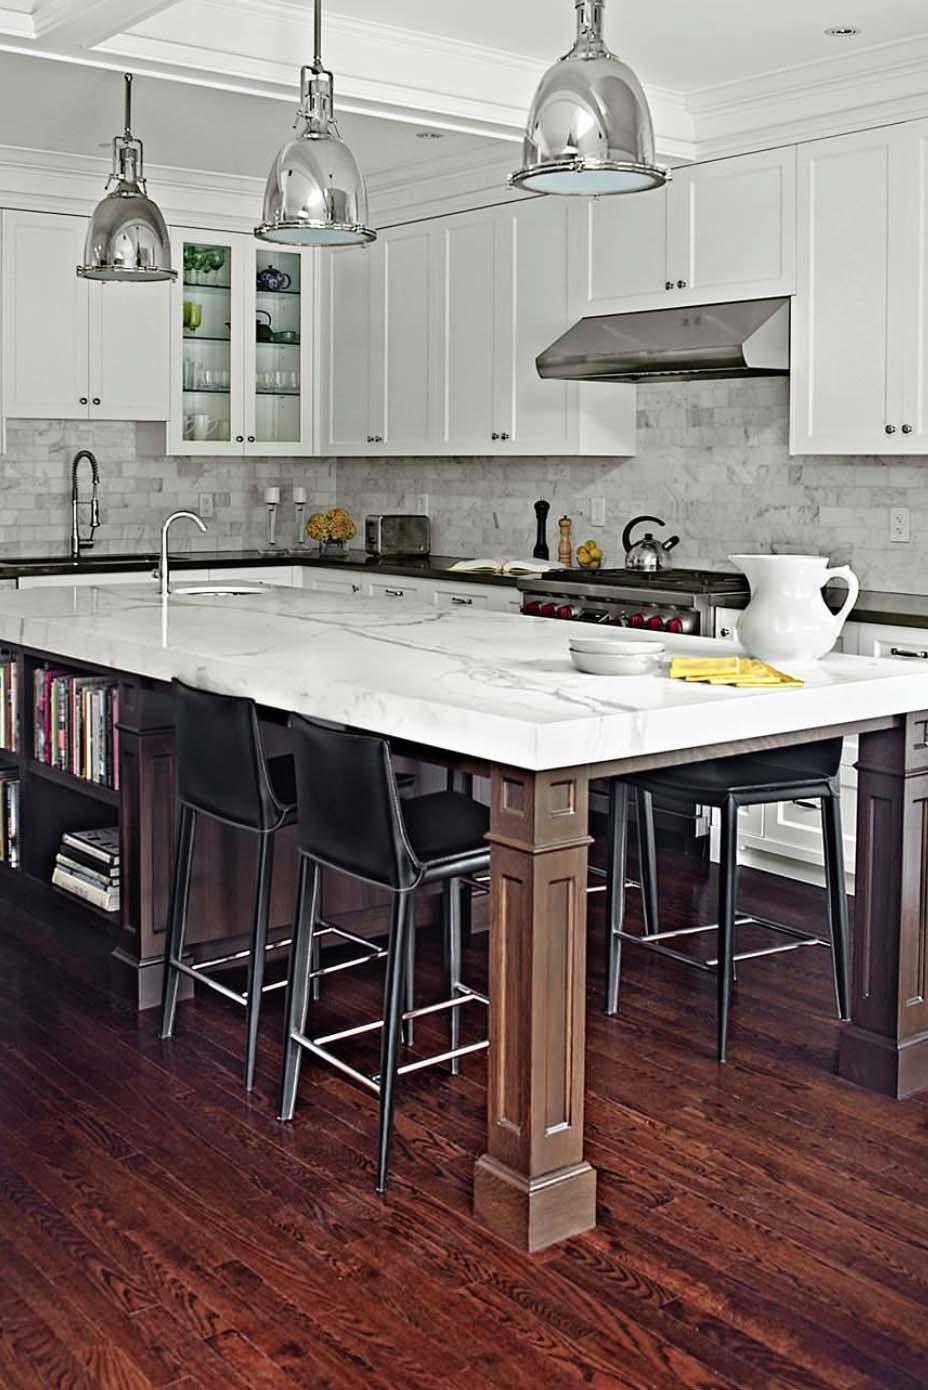 30 brilliant kitchen island ideas that make a statement kitchen seating kitchen with long on kitchen ideas with island id=81348